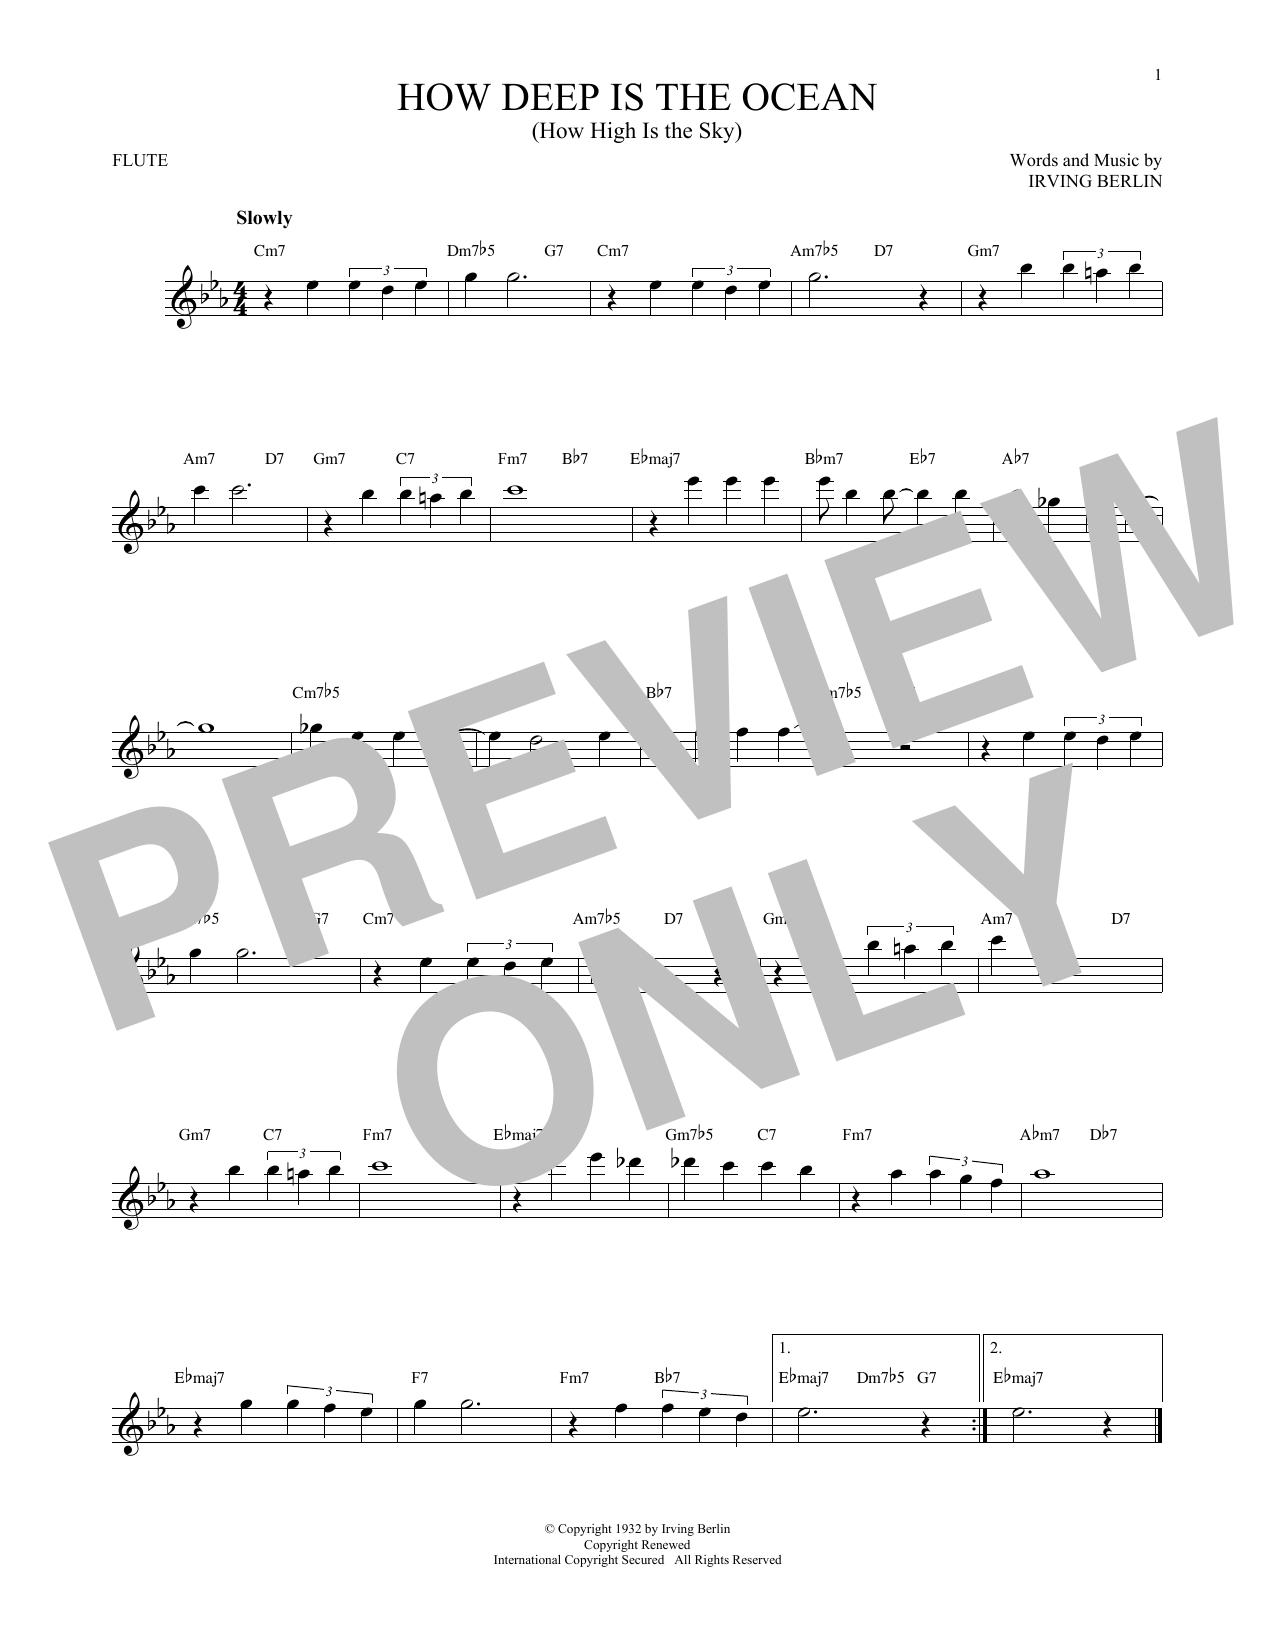 Partition flûte How Deep Is The Ocean (How High Is The Sky) de Irving Berlin - Flute traversiere